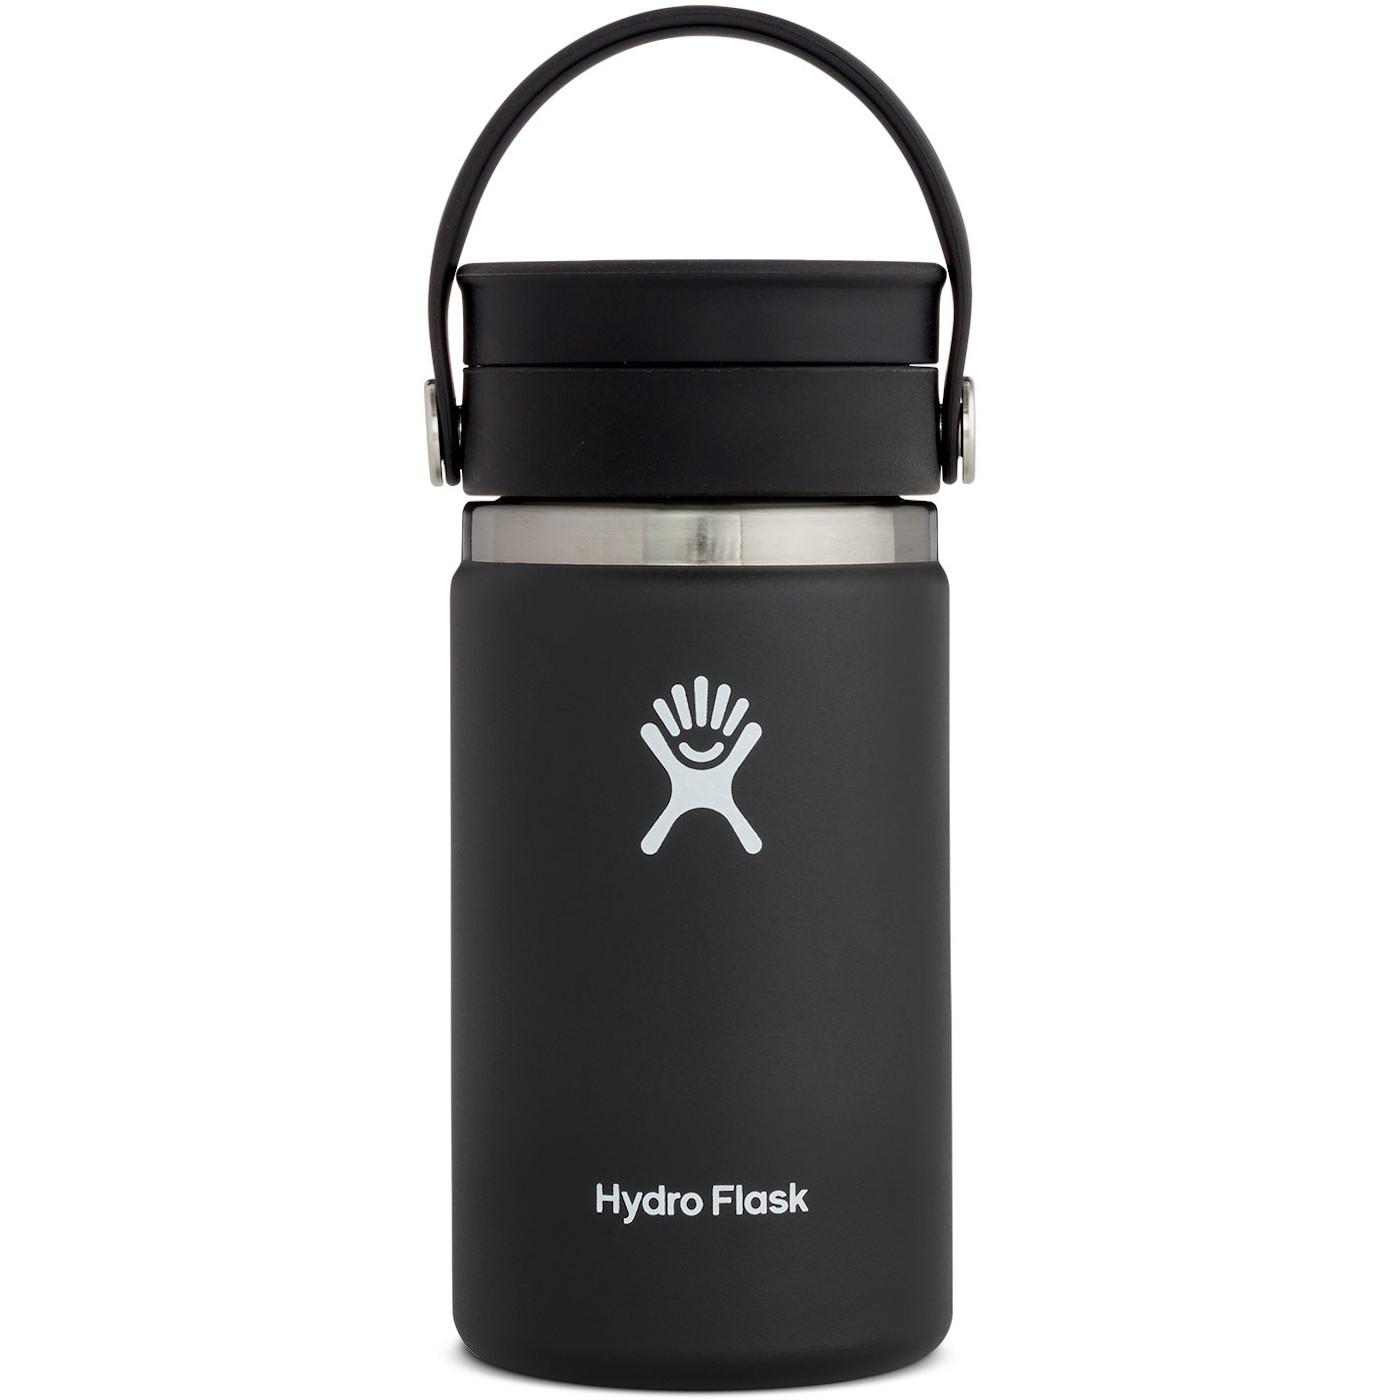 Hydro Flask 12 oz Wide Mouth Coffee Kaffeebecher mit Flex Sip Deckel - 354 ml - Black